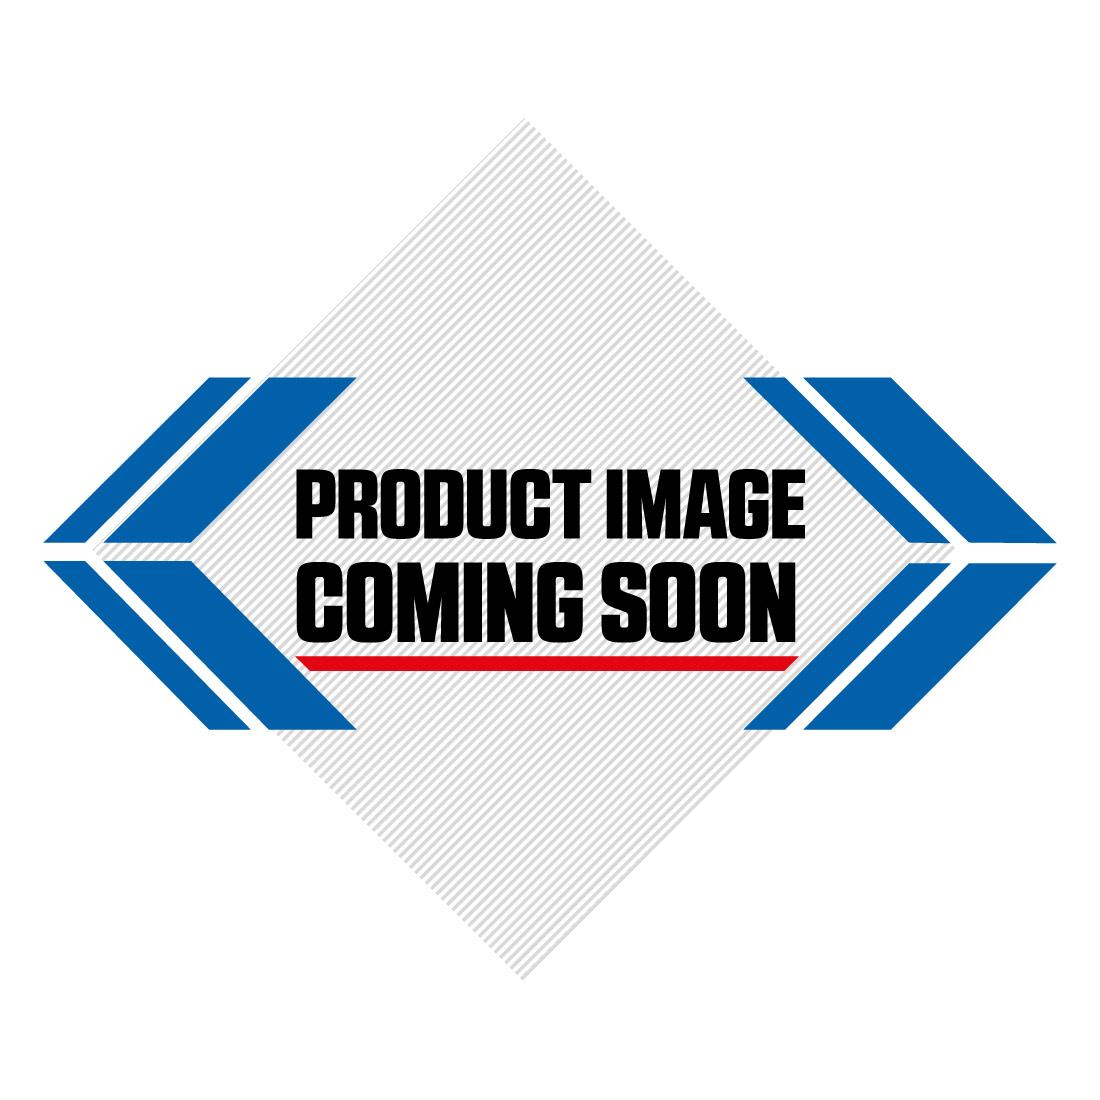 UFO Honda Radiator louvers CRF 250R (18-19) CRF 250RX (2019) OEM Factory Image-1>